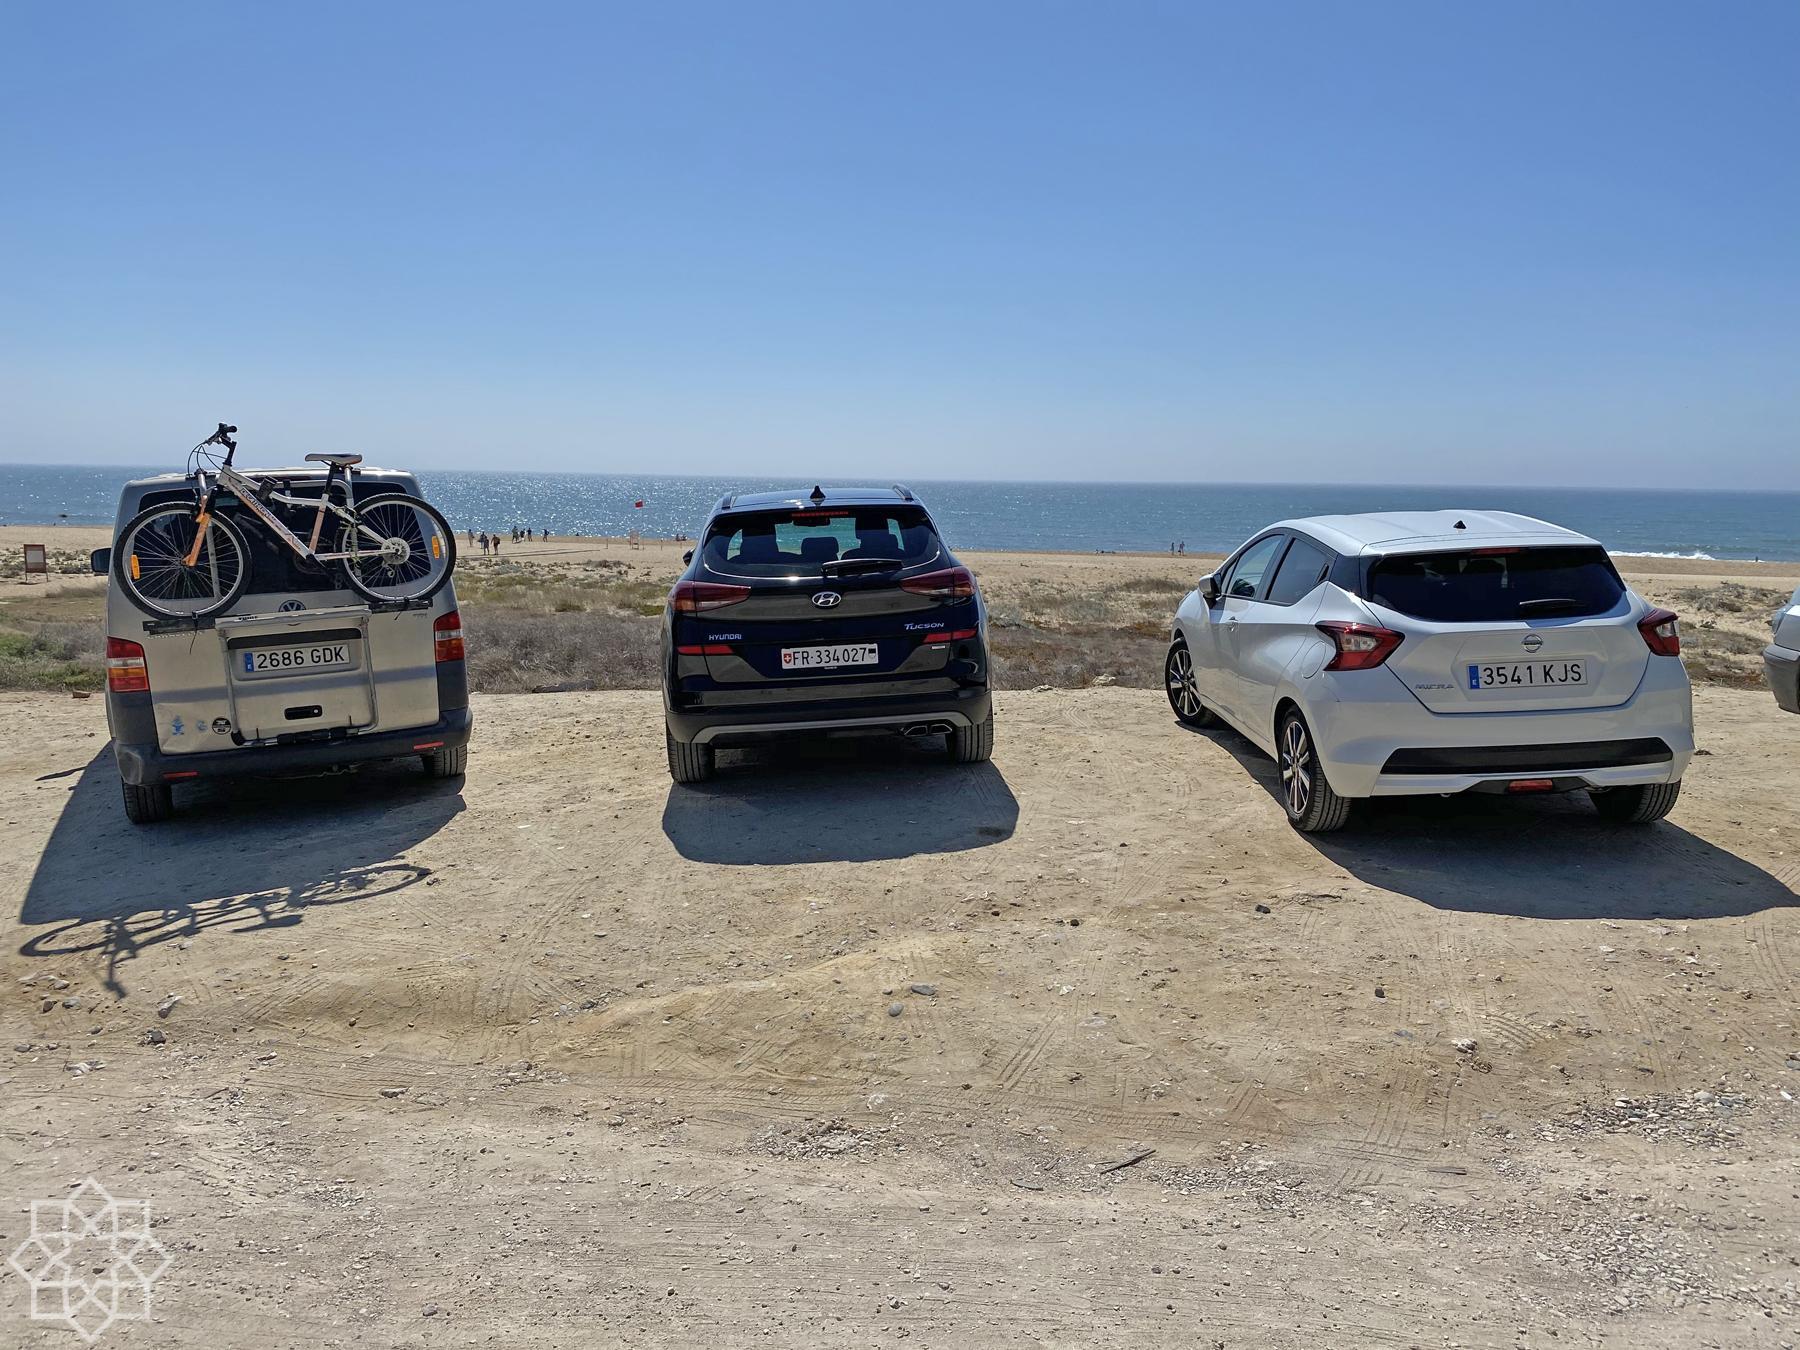 Internationell turism på Praia do Norte